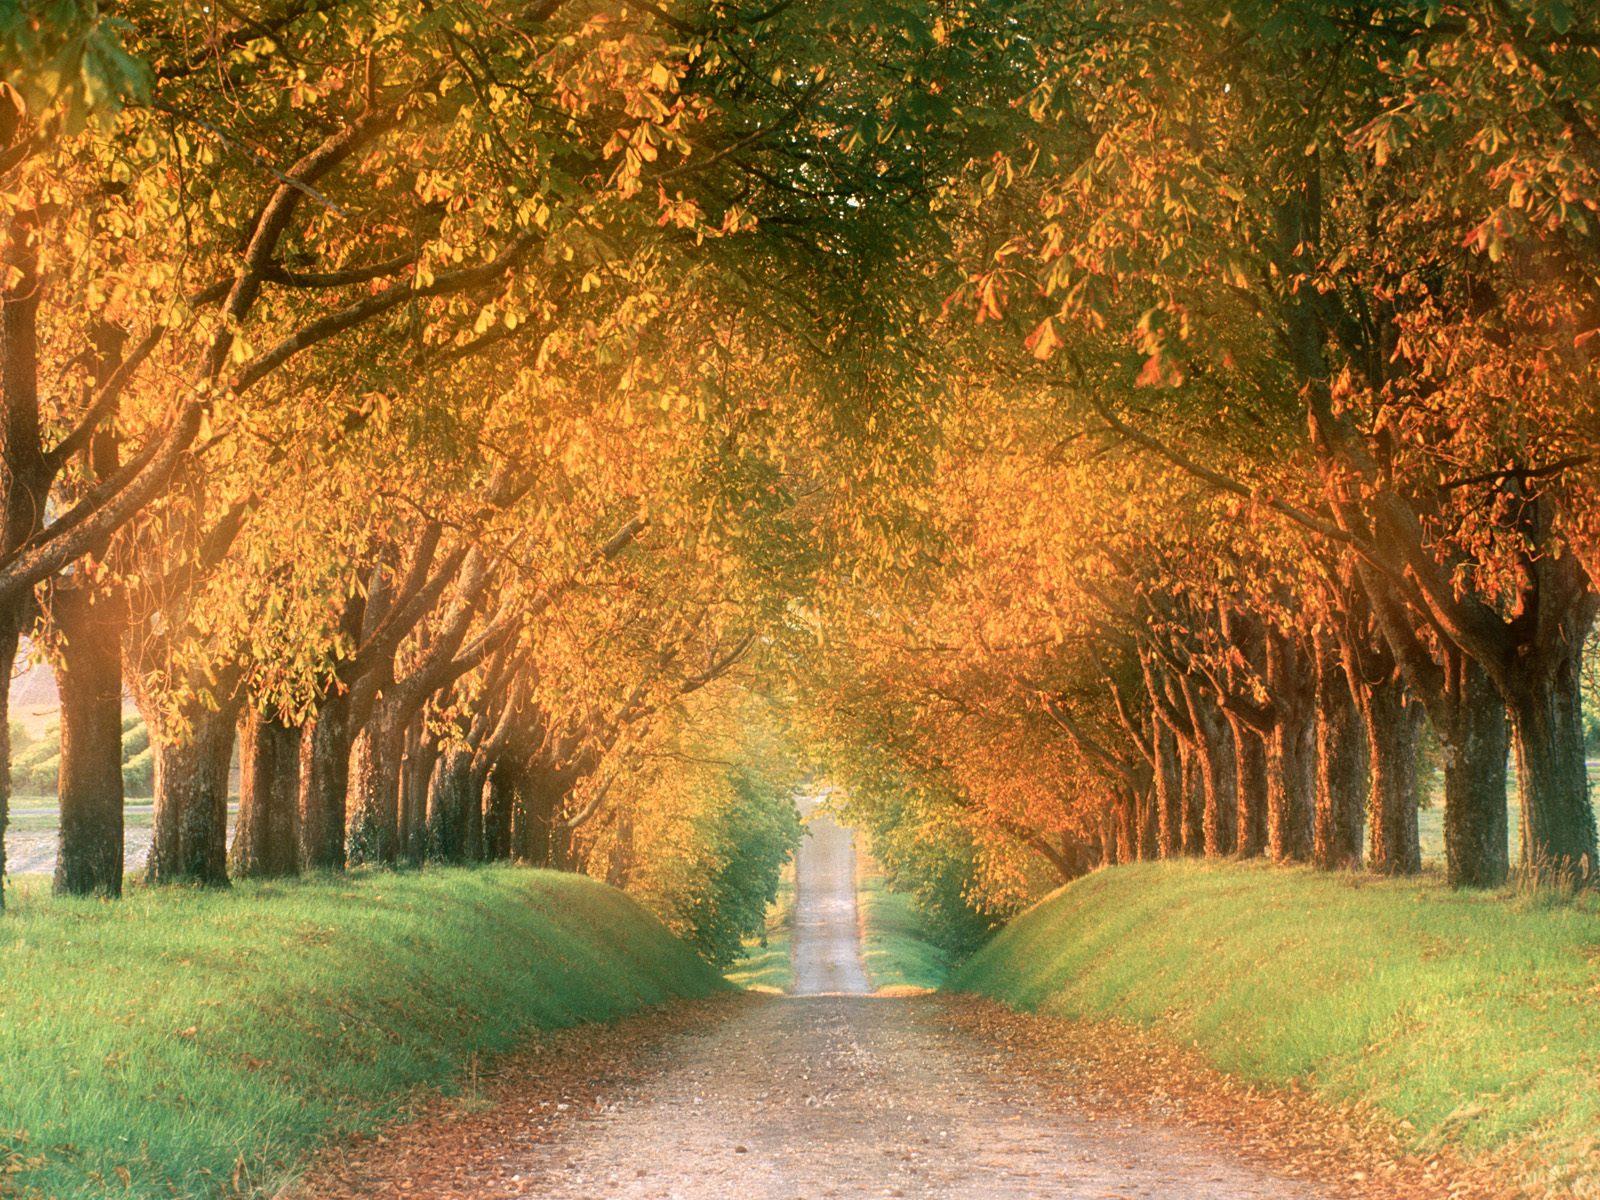 Autumn Road, Cognac Region, France